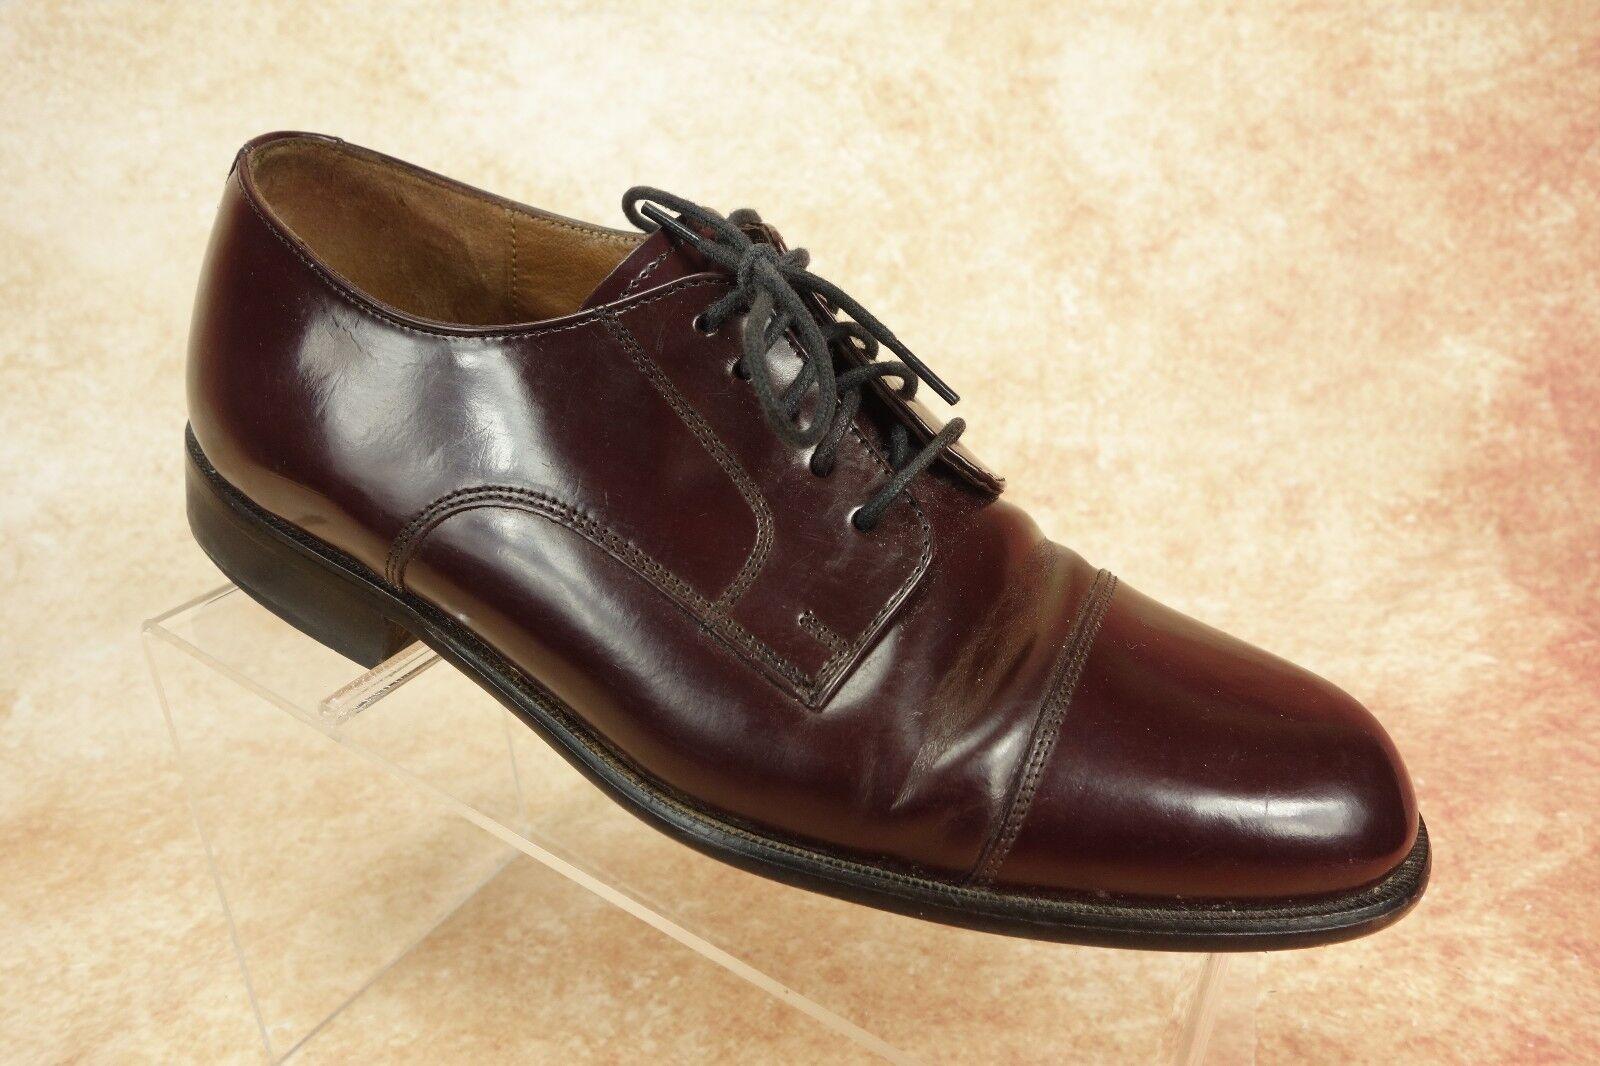 Bostonian Classics Burgundy Leather Cap Toe Oxford Derby Dress shoes Mens Sze 9M